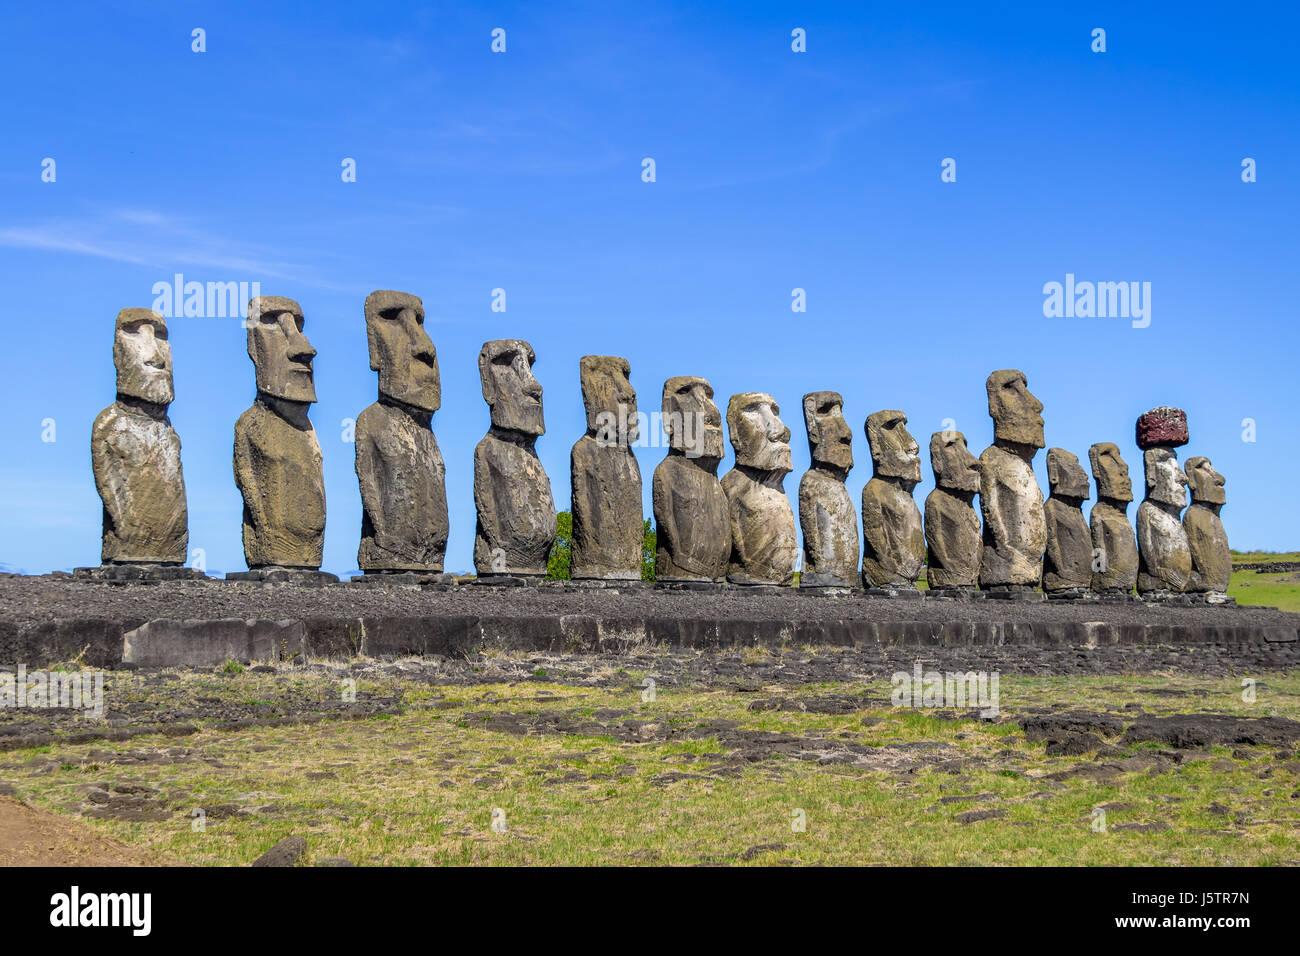 Moai Statues of Ahu Tongariki - Easter Island, Chile - Stock Image